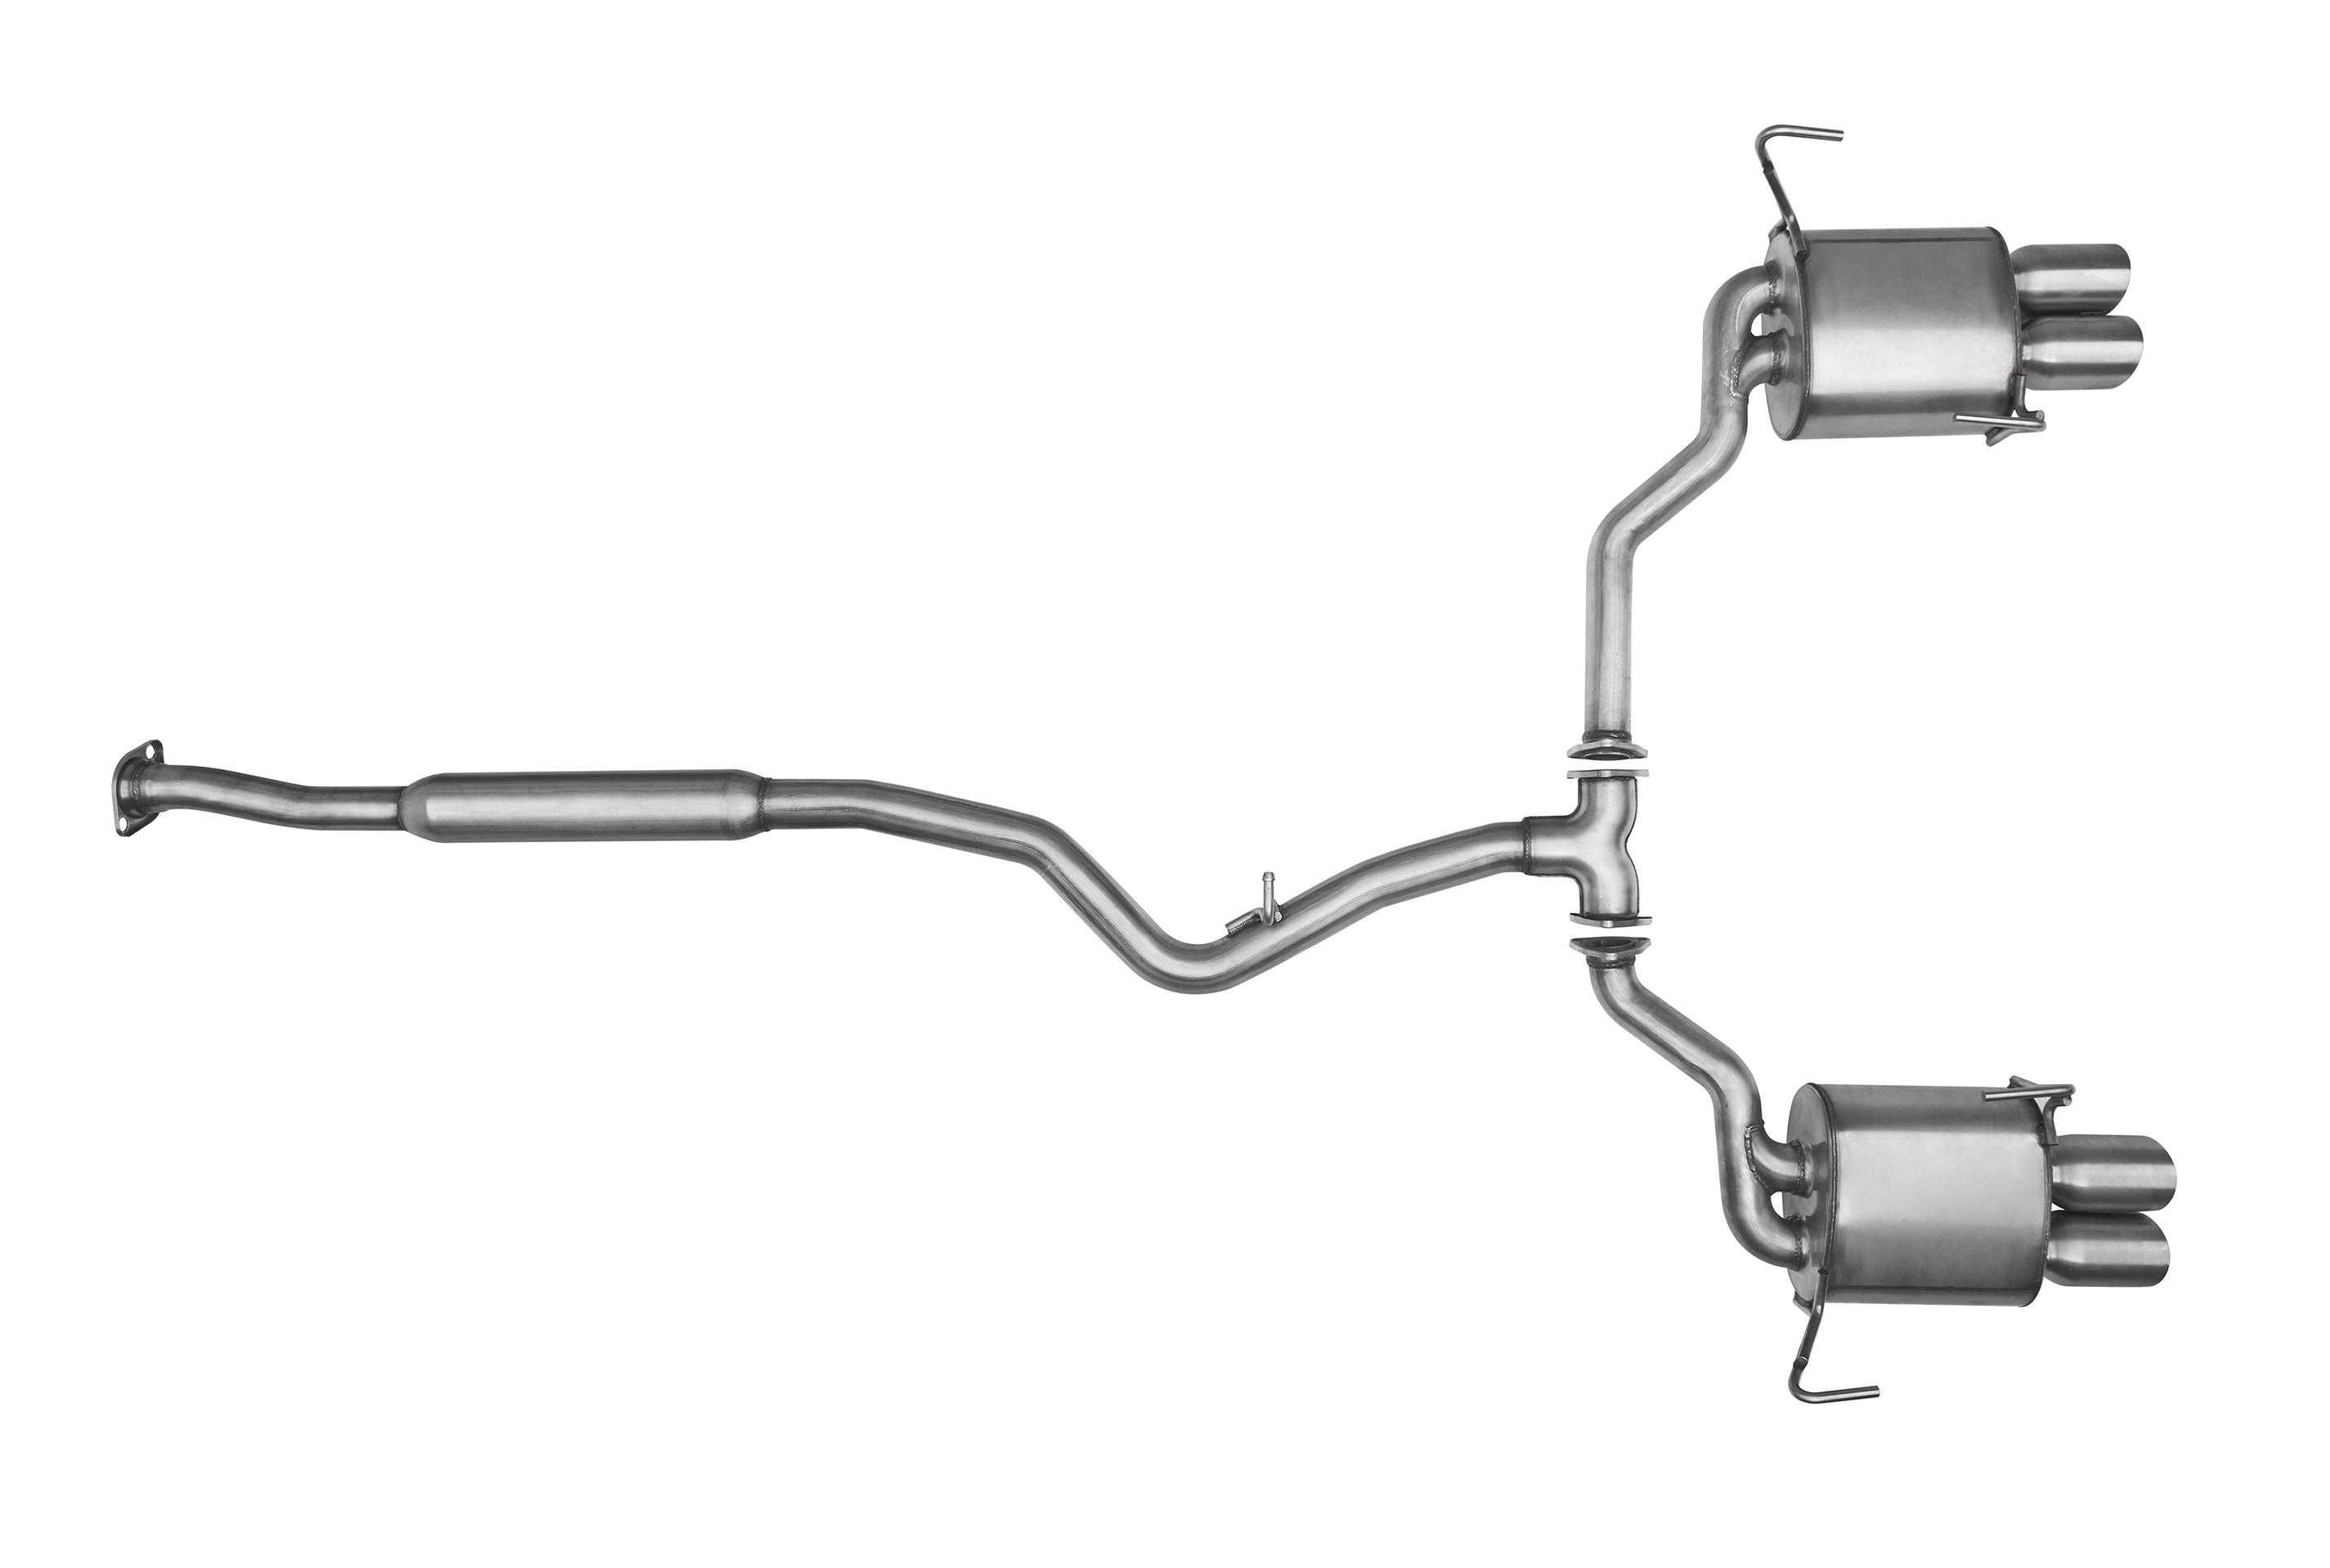 Shop Genuine 2018 Subaru WRX Accessories from Heuberger Subaru